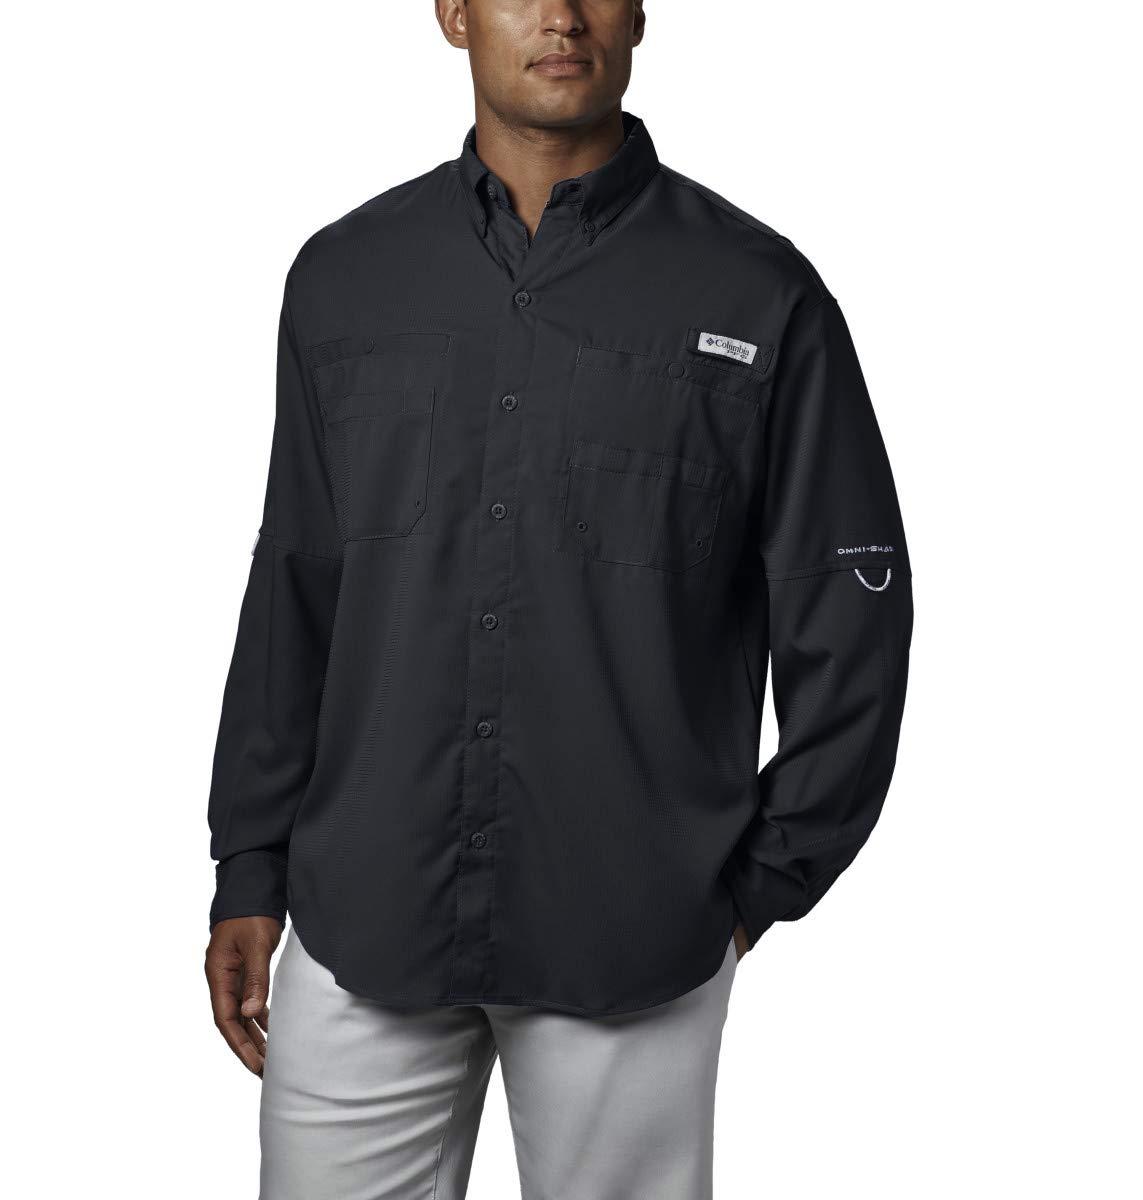 Columbia Men's PFG Tamiami II Long Sleeve Shirt - Big , Black, X-Small